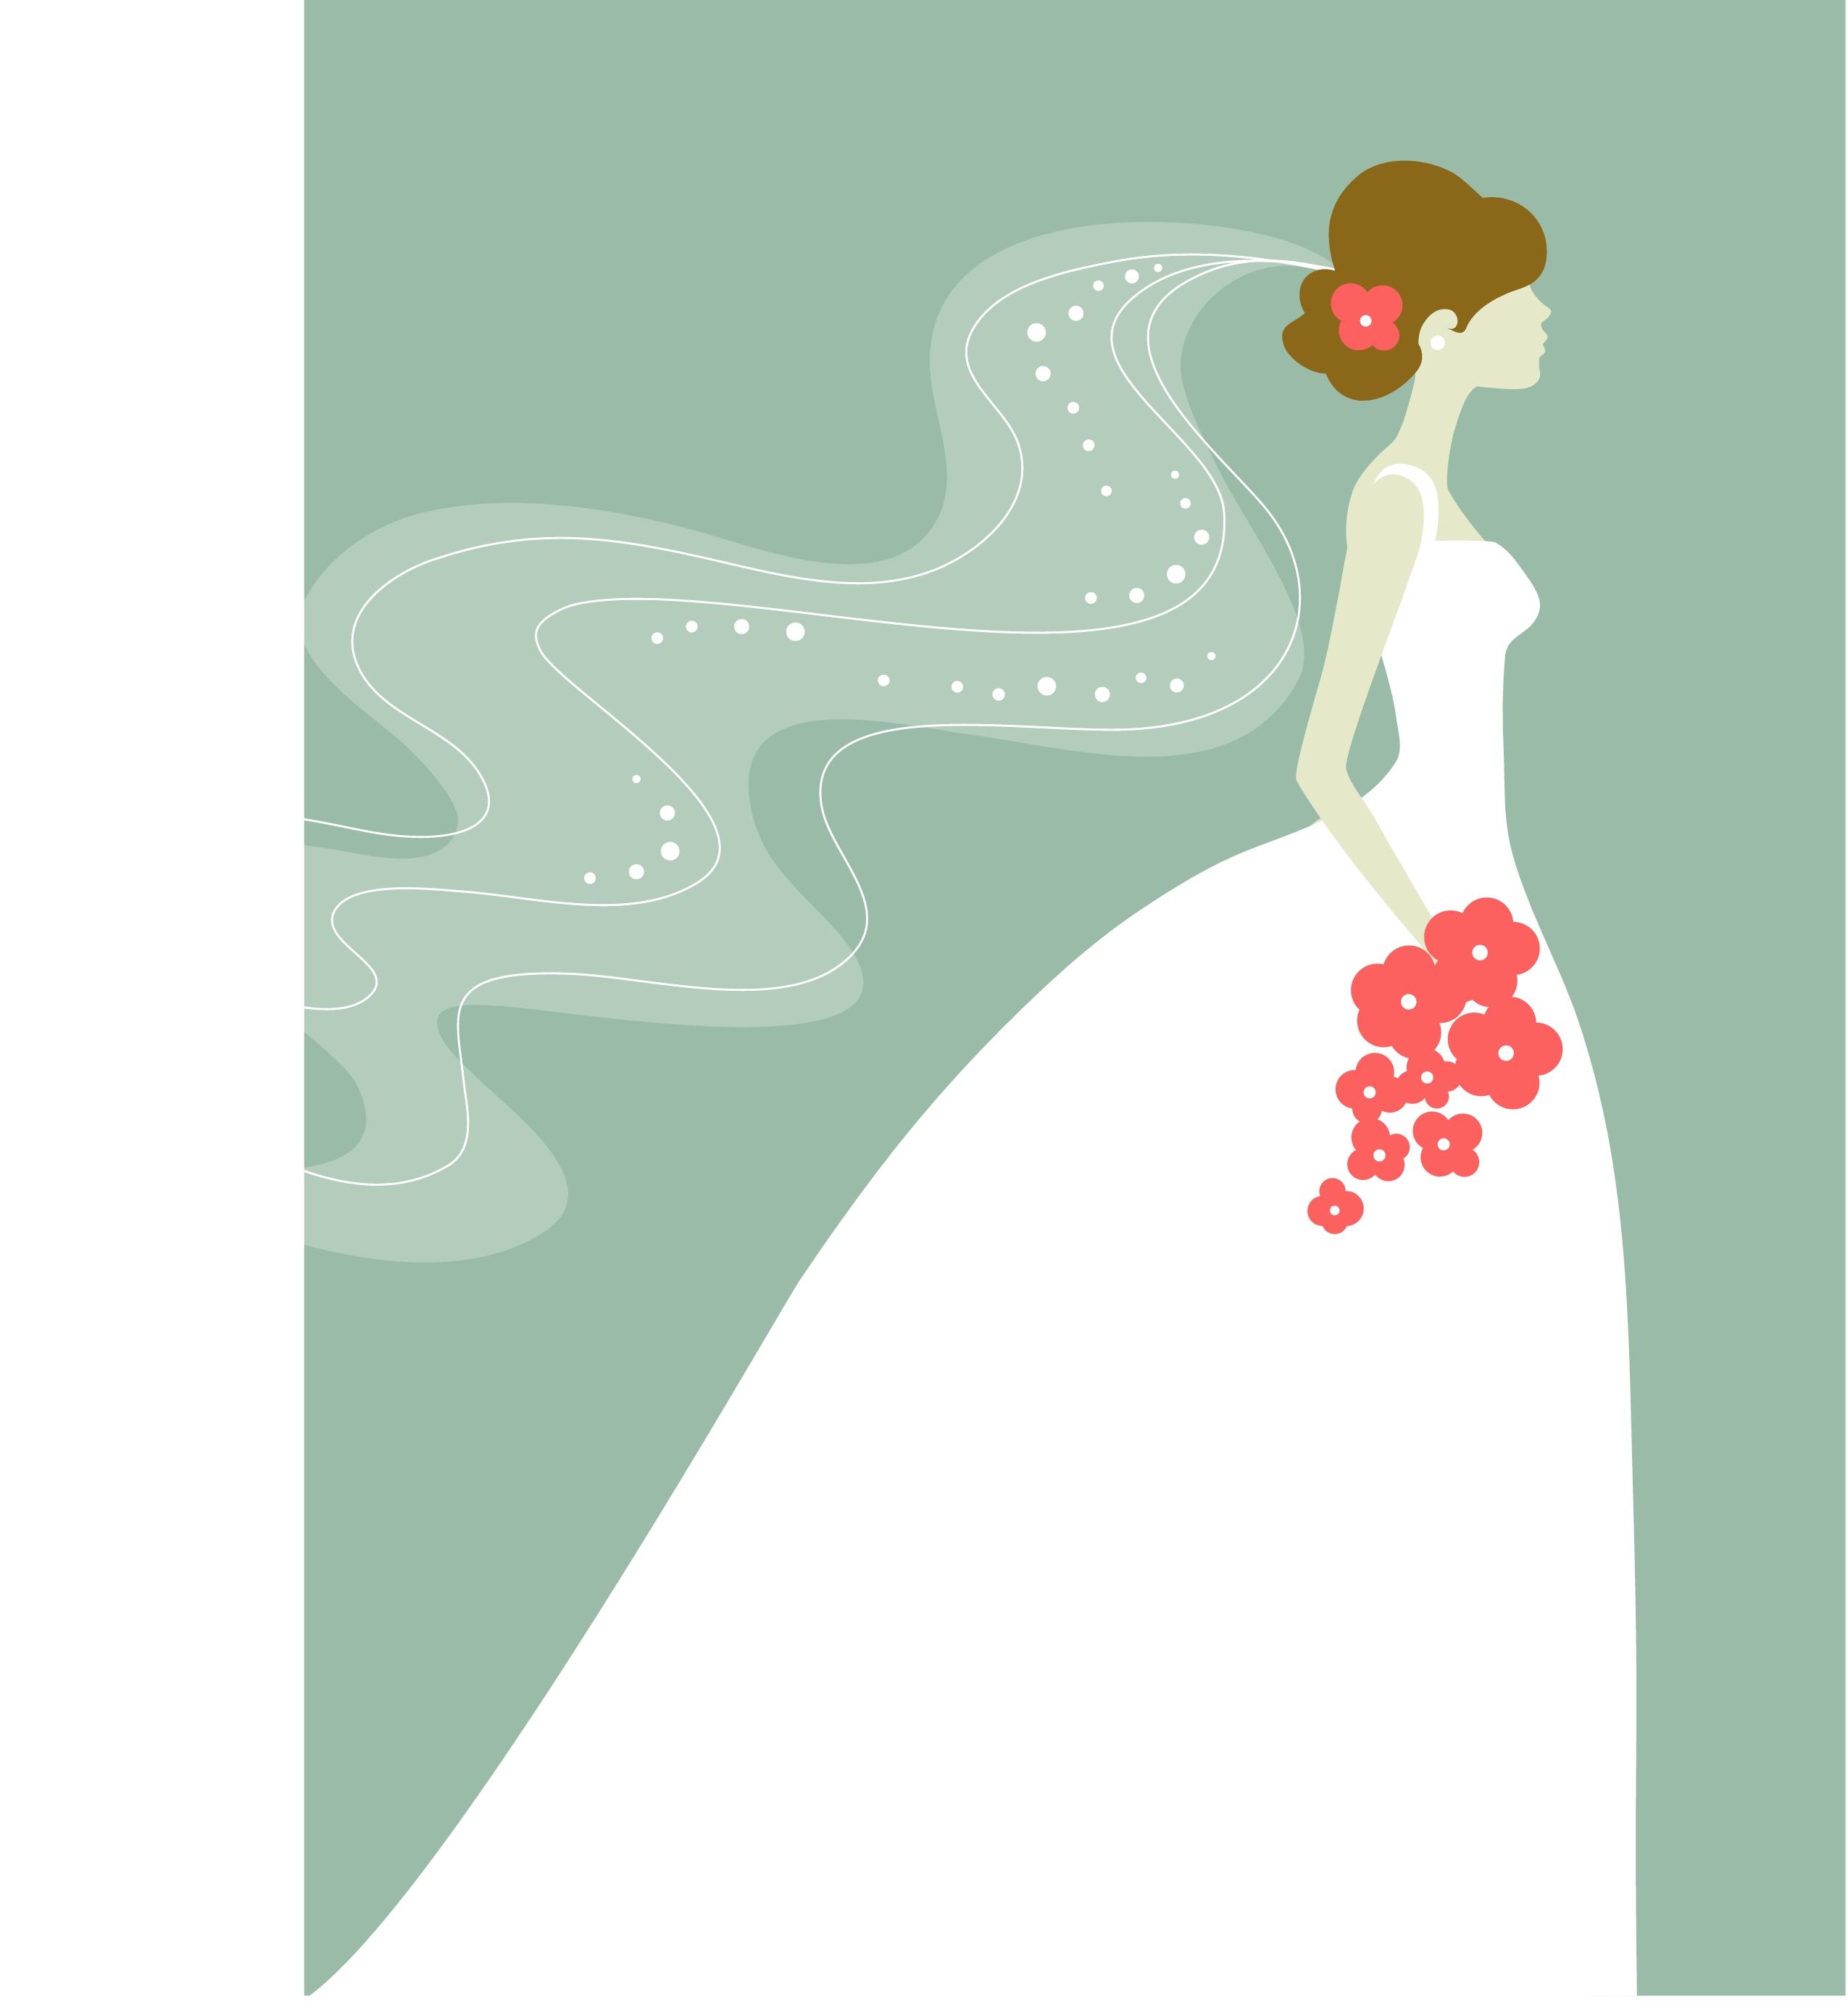 Bridal Cliparts #37234 (License: Personal Use)